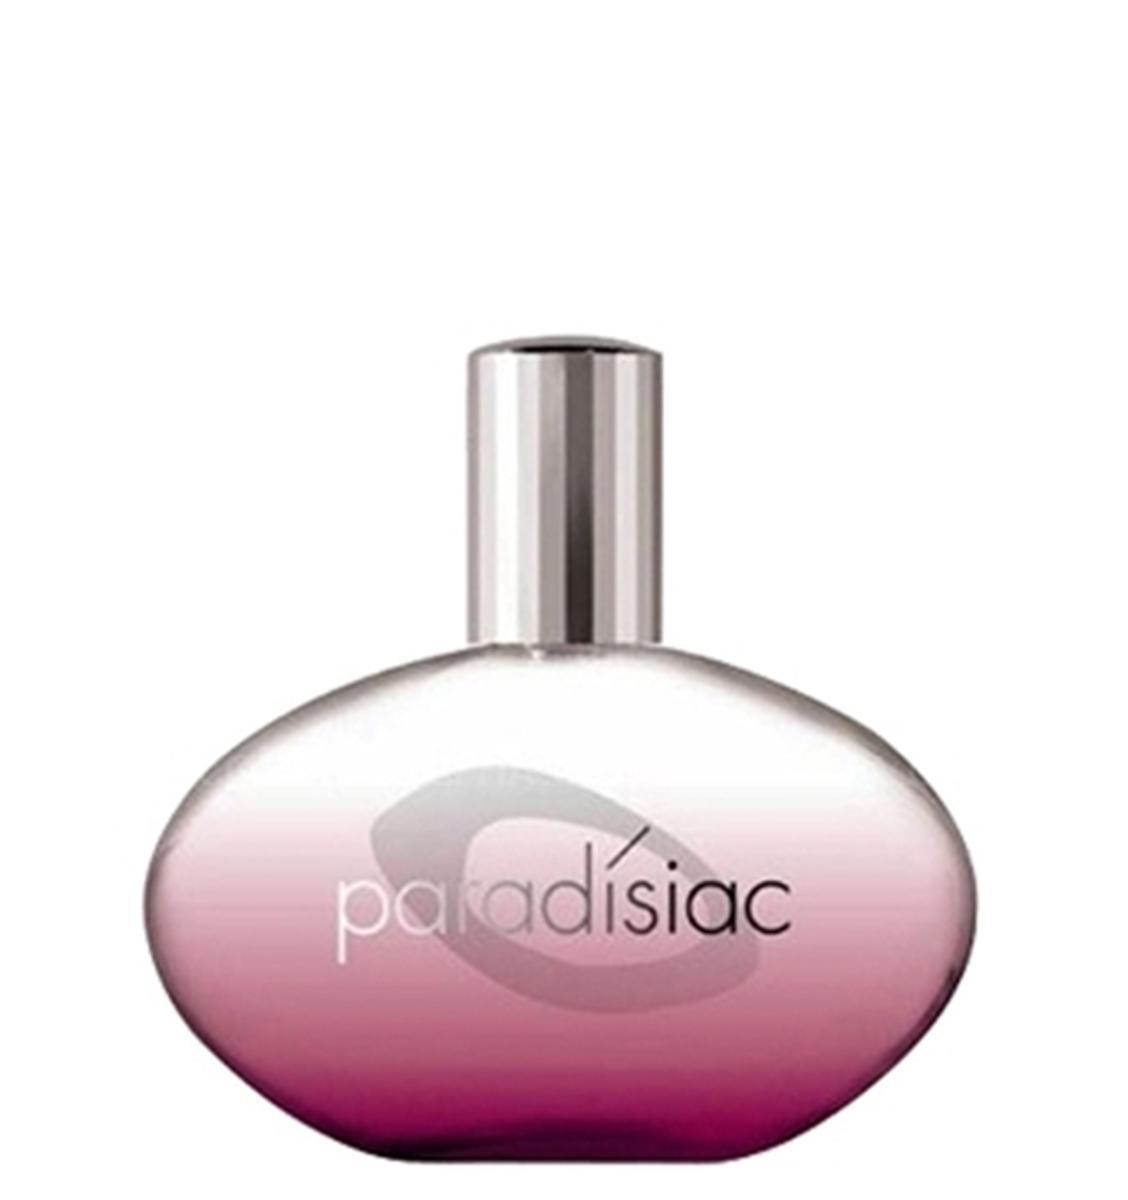 Paradisiac perfume